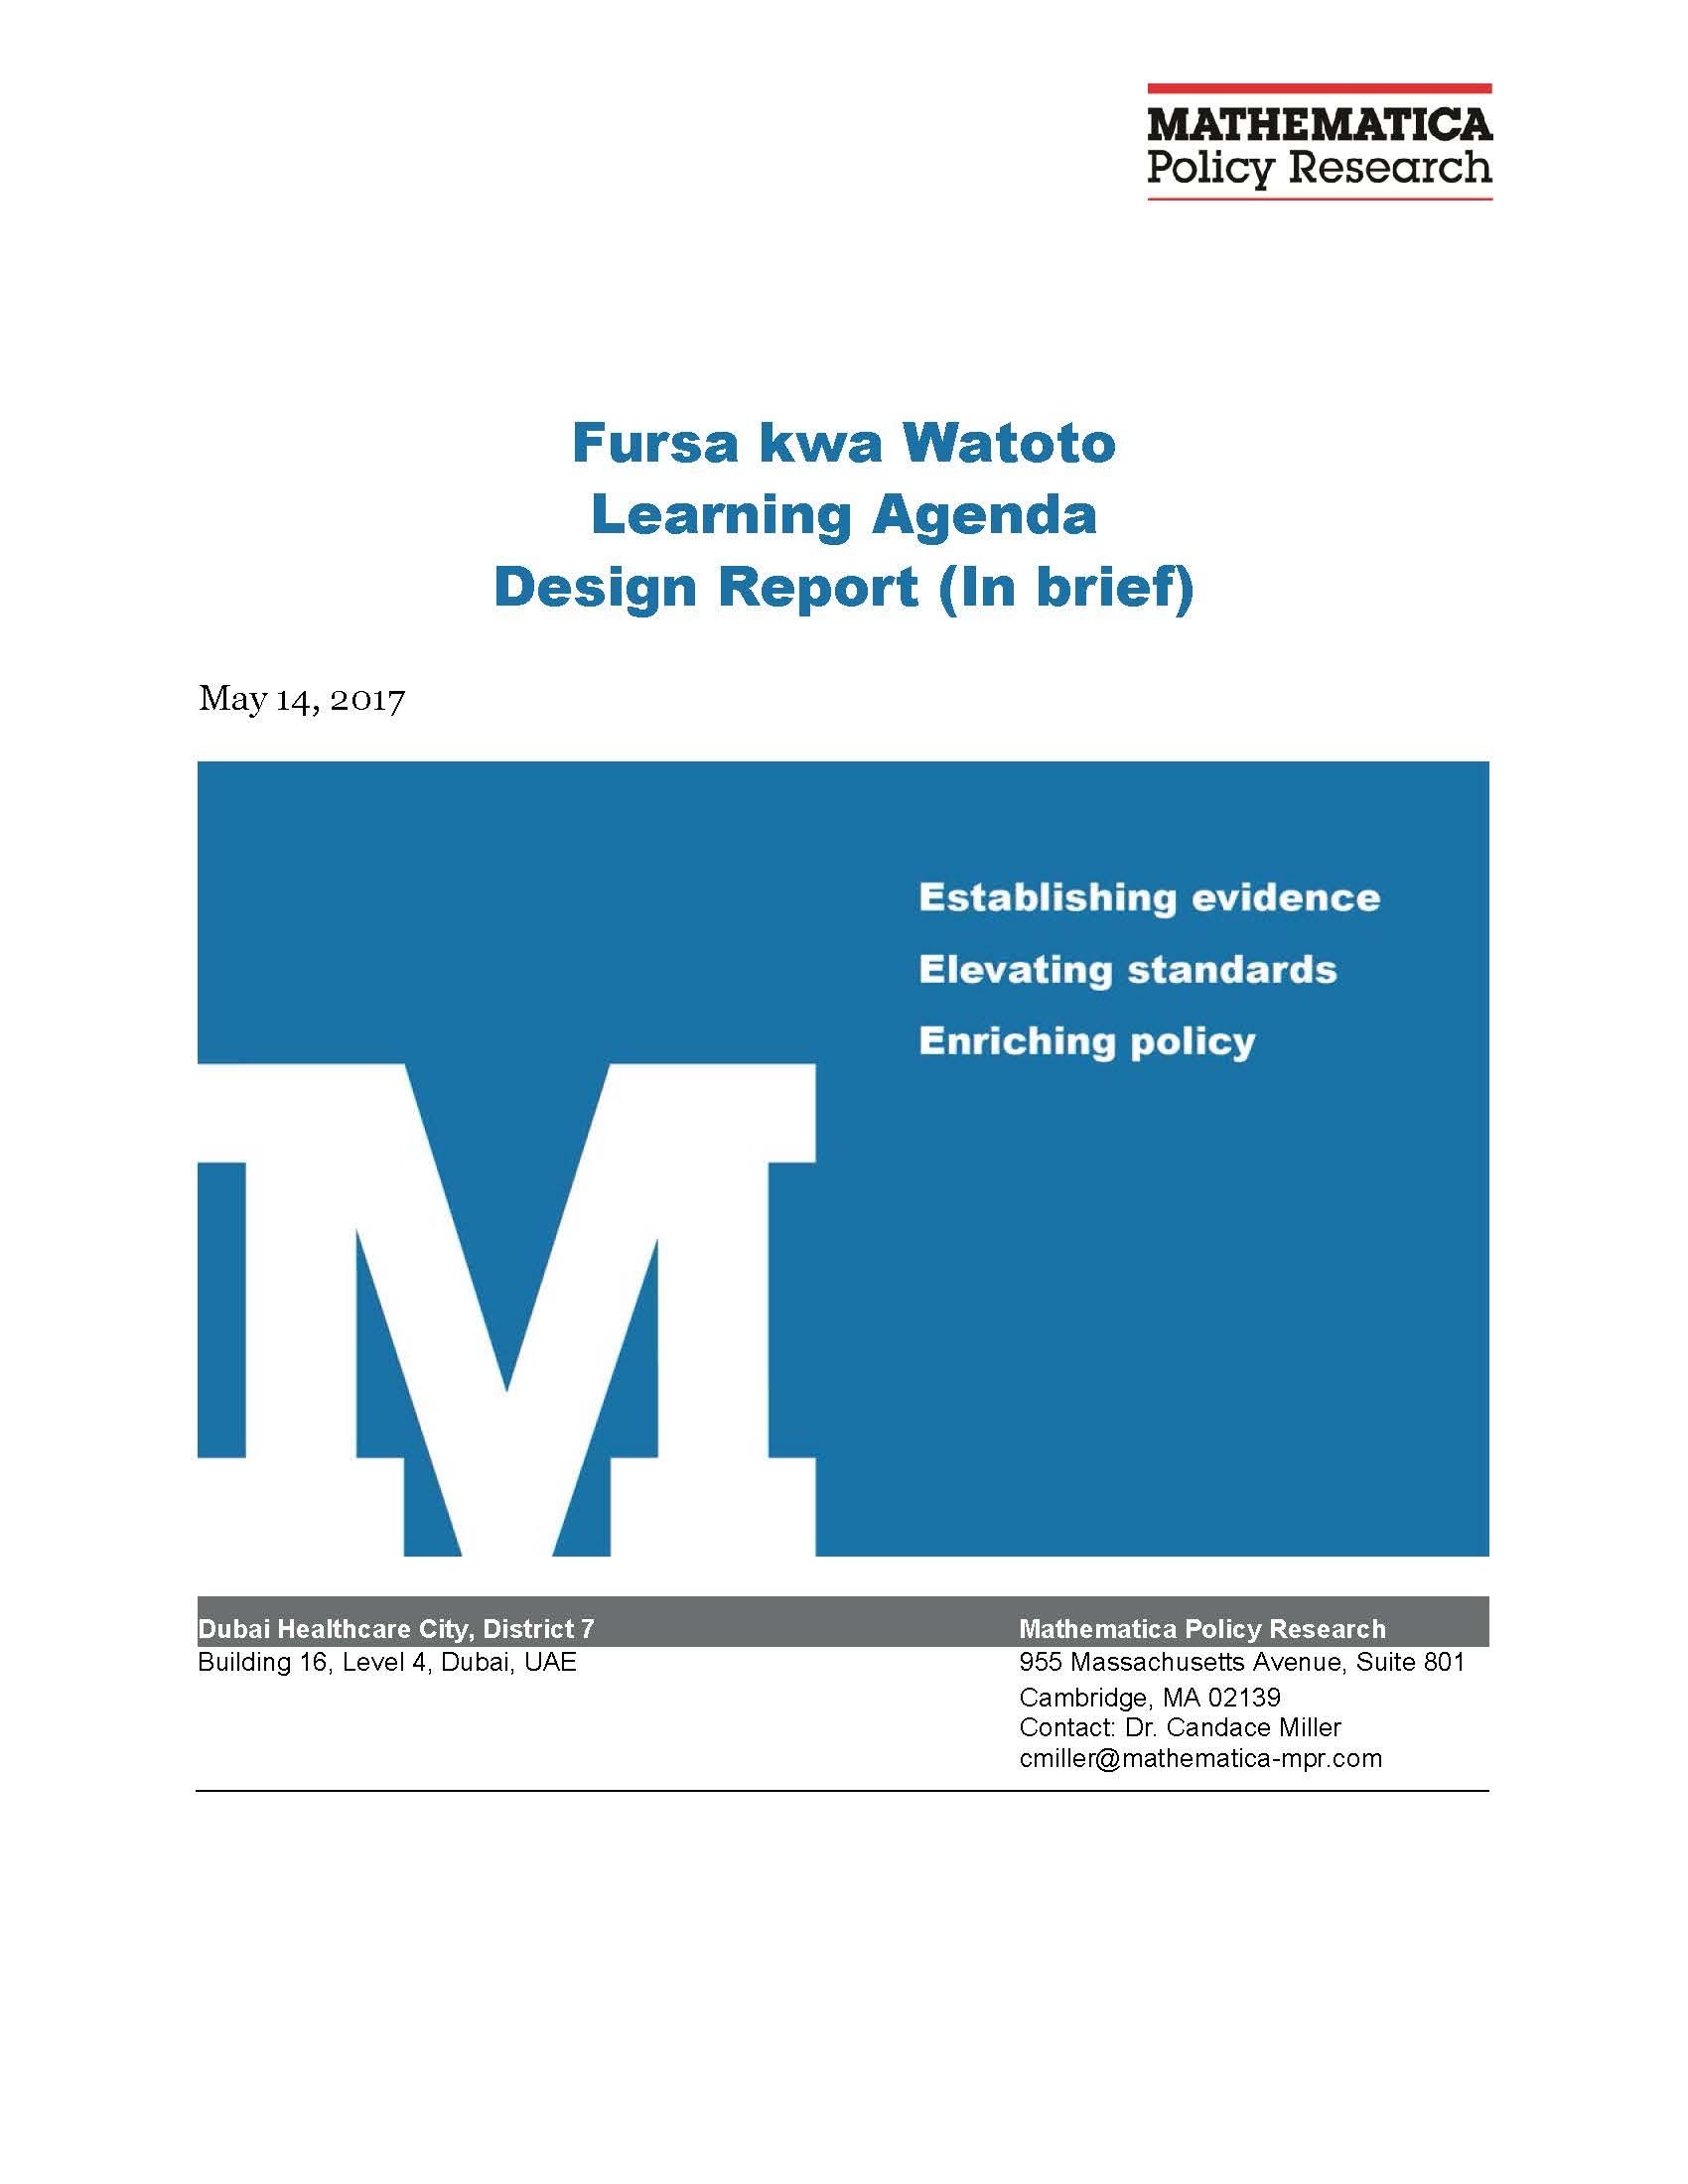 Learning Agenda Design in Brief